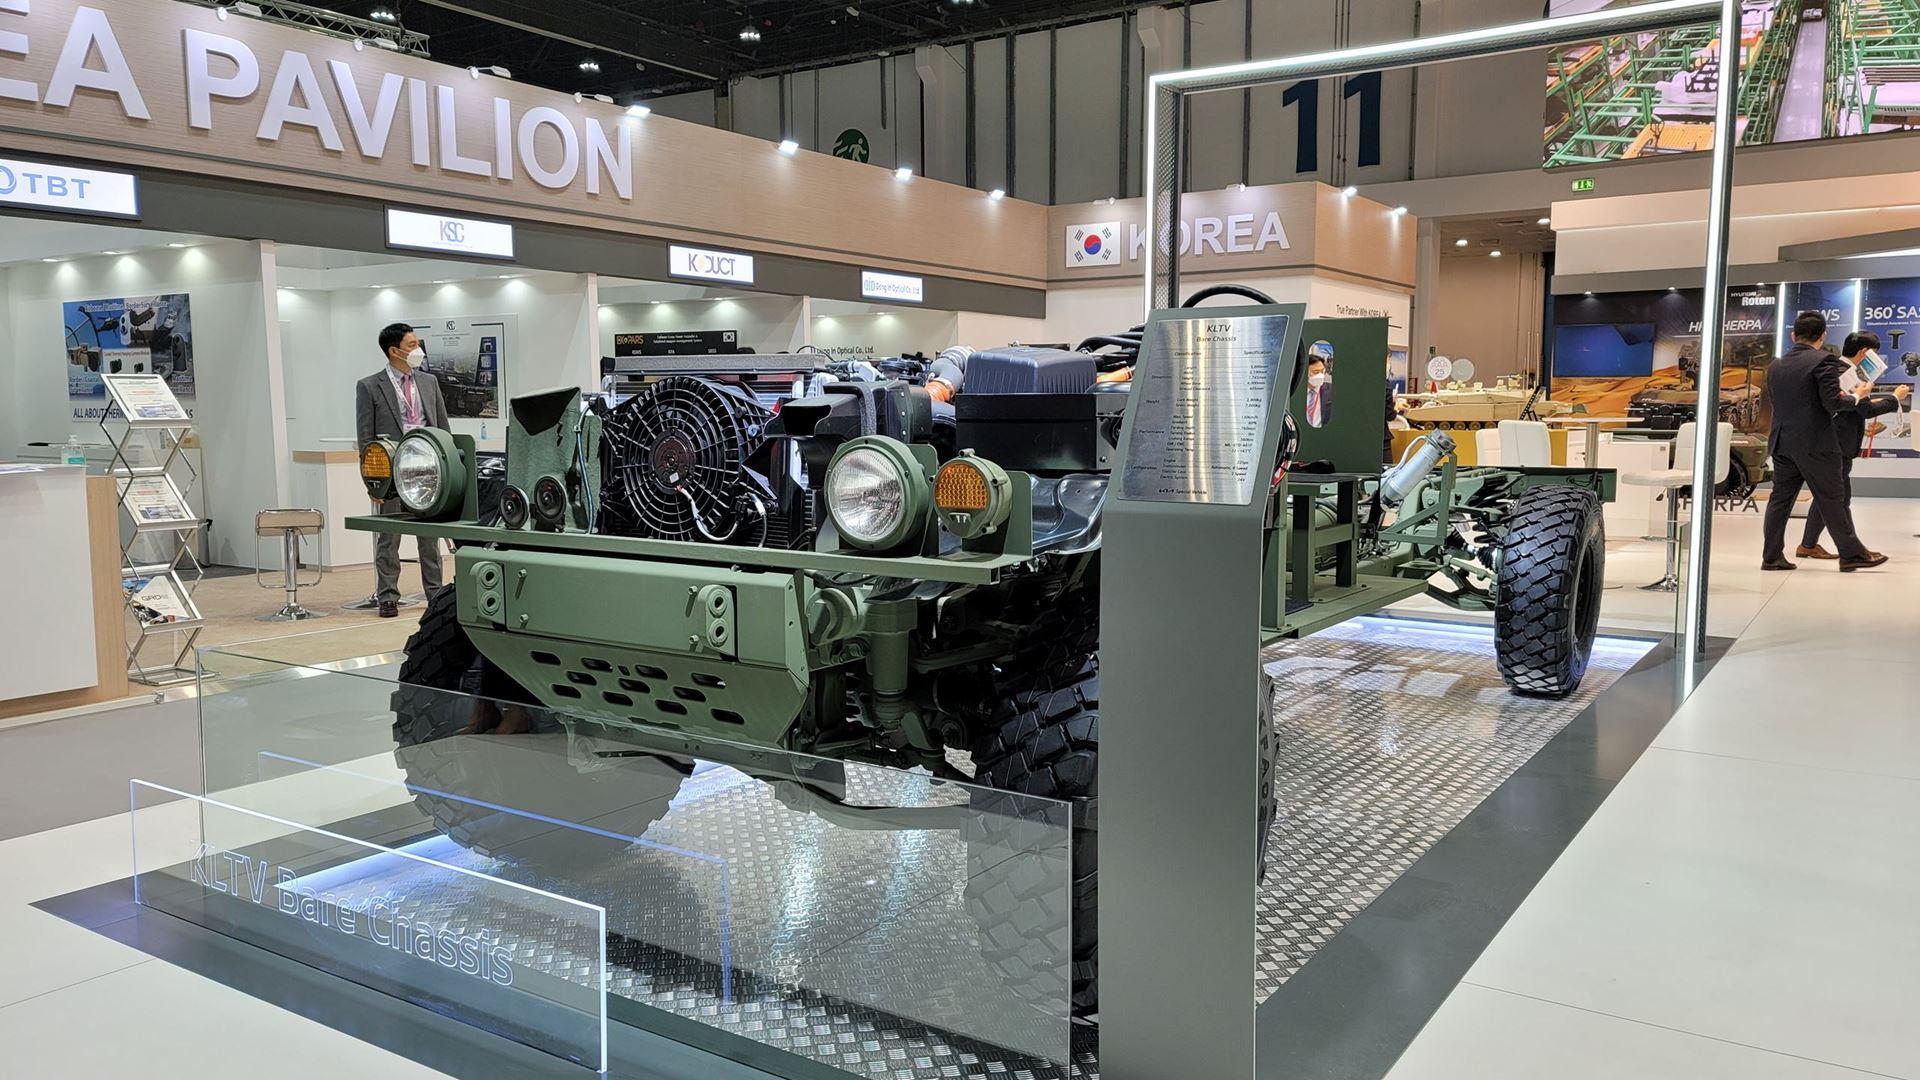 Kia showcases new defense vehicle technologies at IDEX 2021 defense exhibition - Image 1